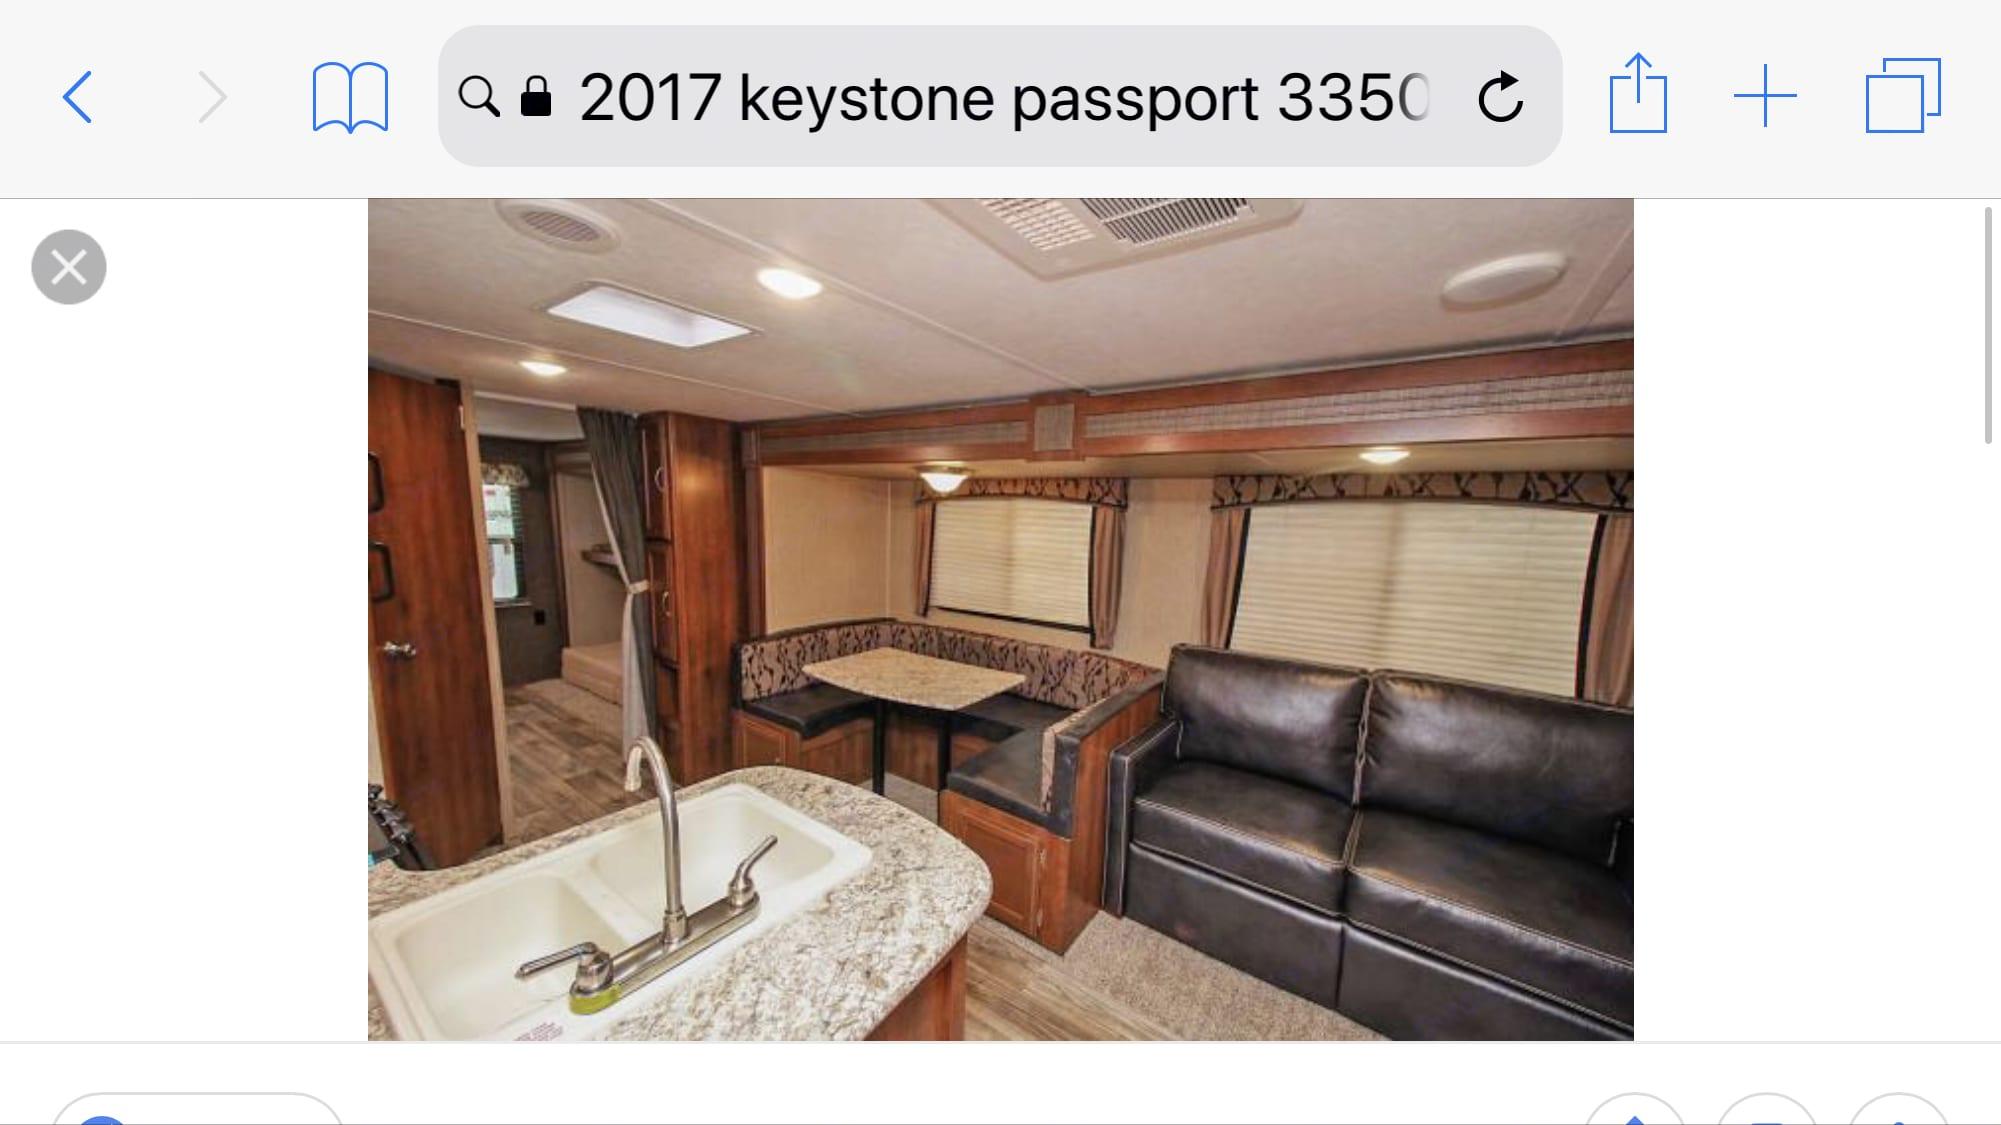 Keystone Passport 2017